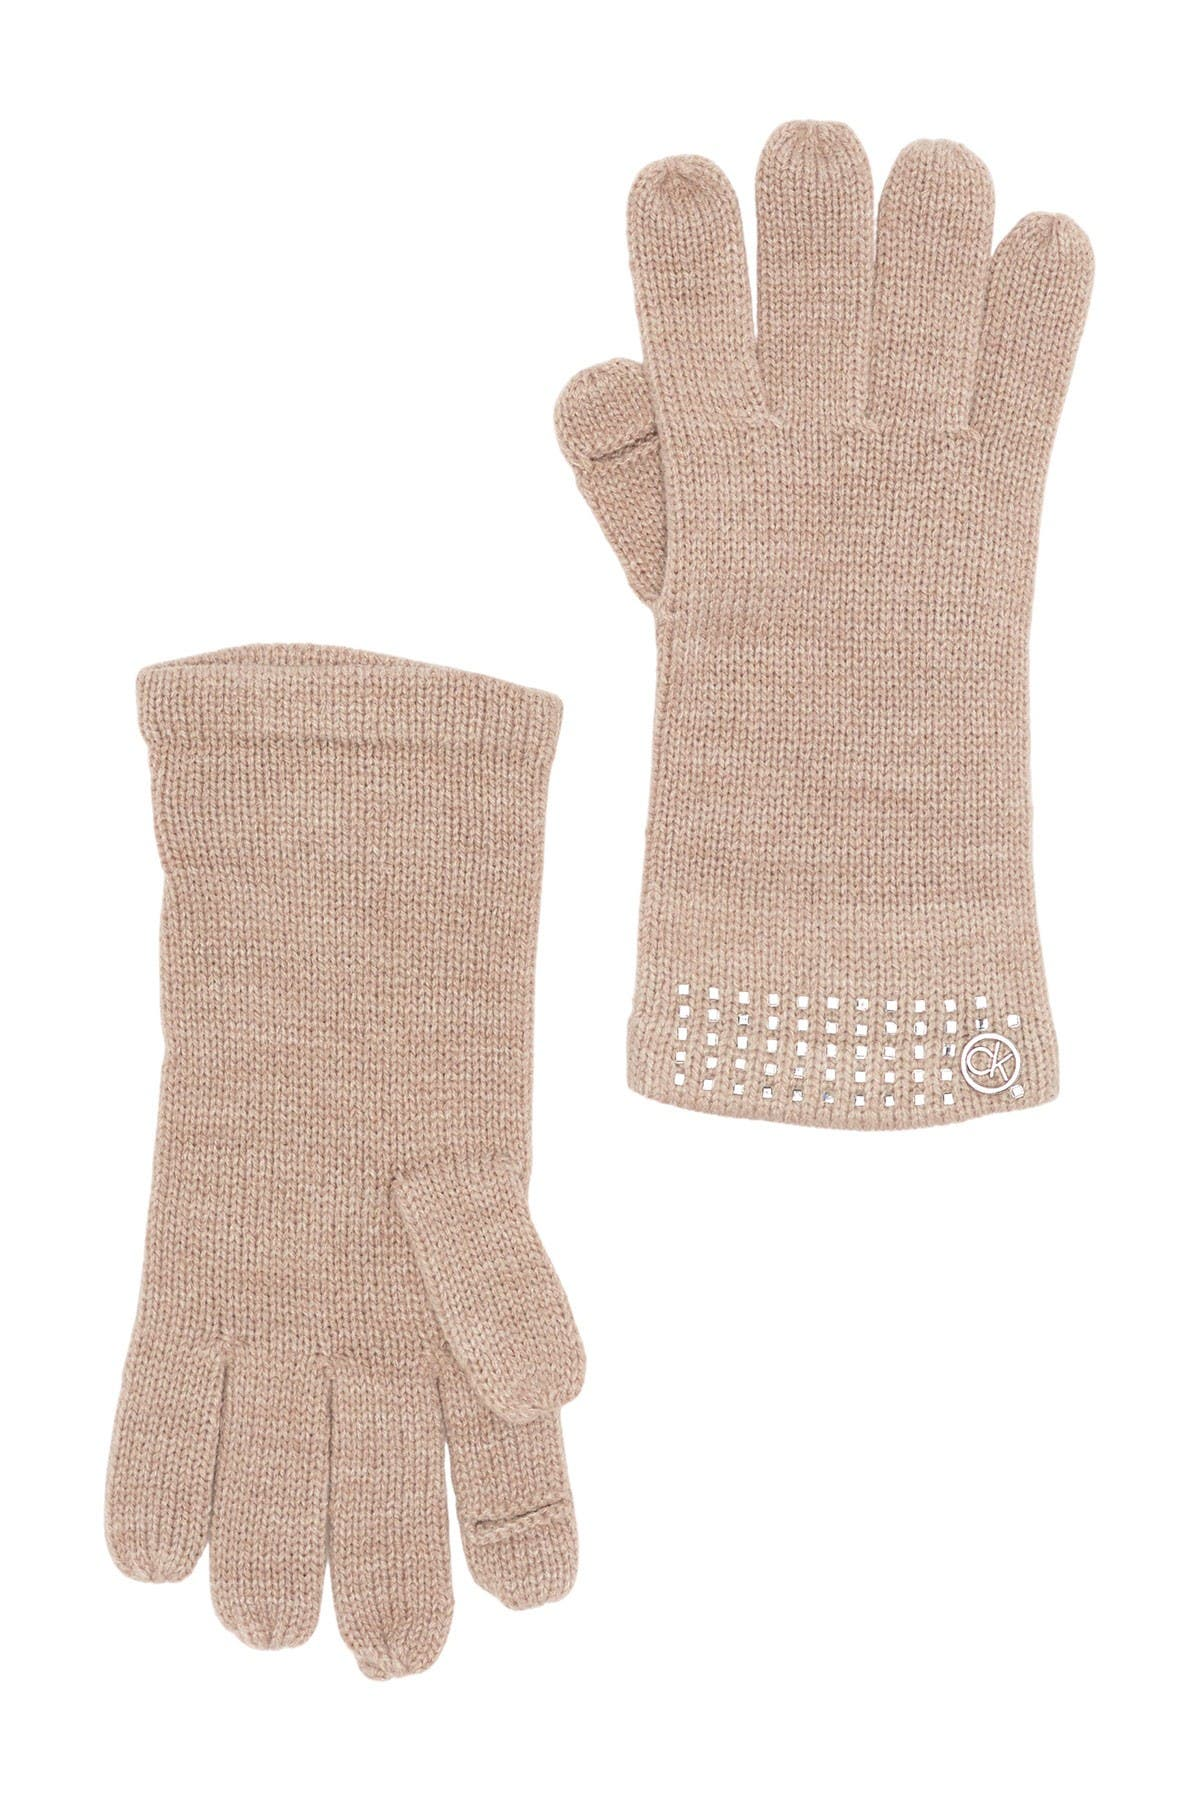 Image of Calvin Klein Square Studded Gloves